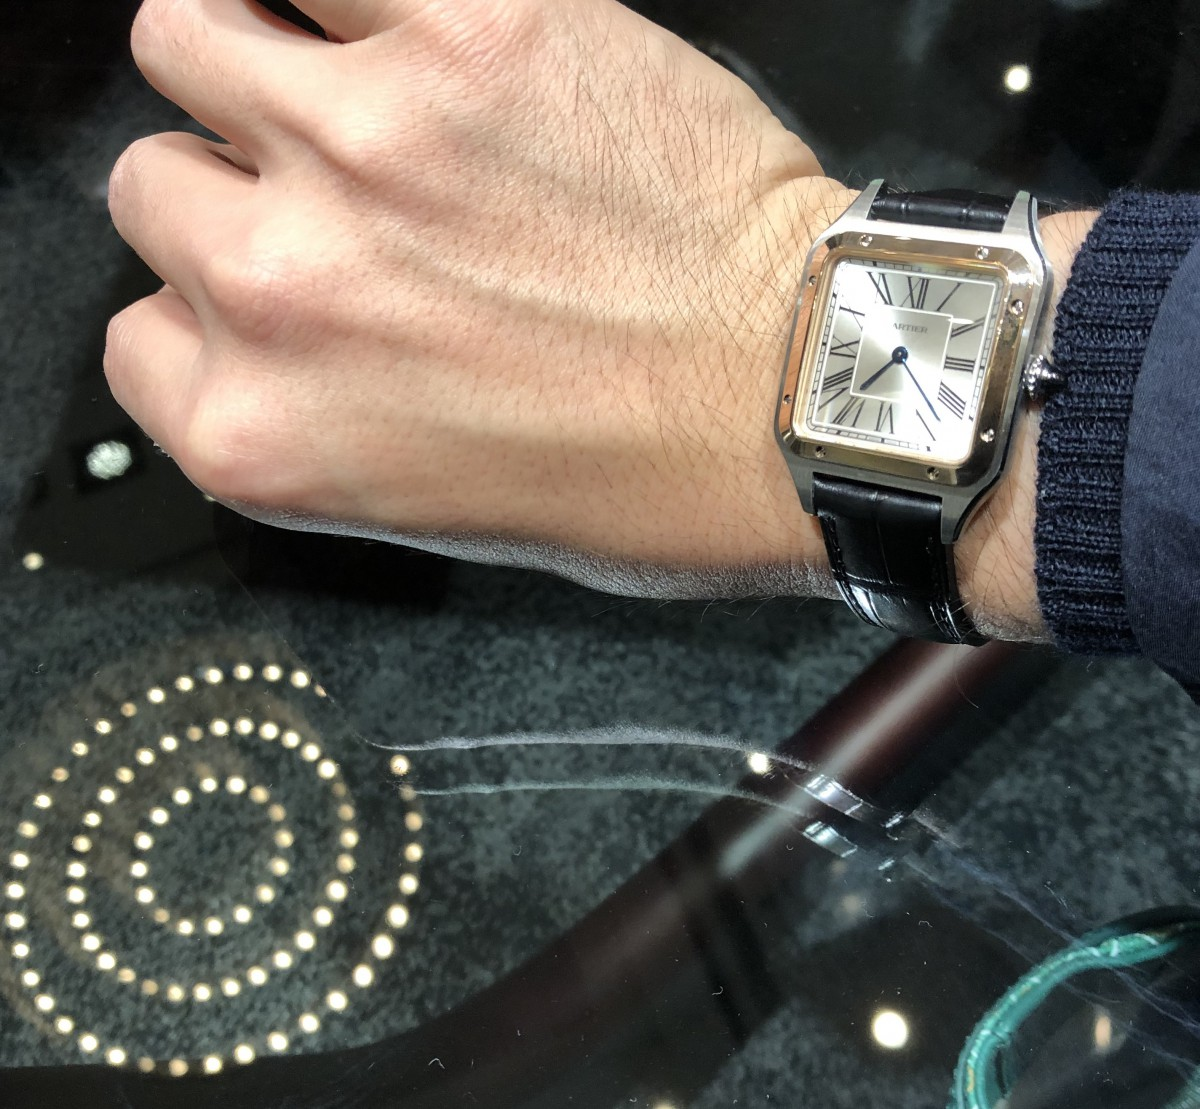 IMG_5230 モナコ、サントス、レベルソ。角型時計に悩める皆様へ、それぞれスタイルが全く違います!|関口 優